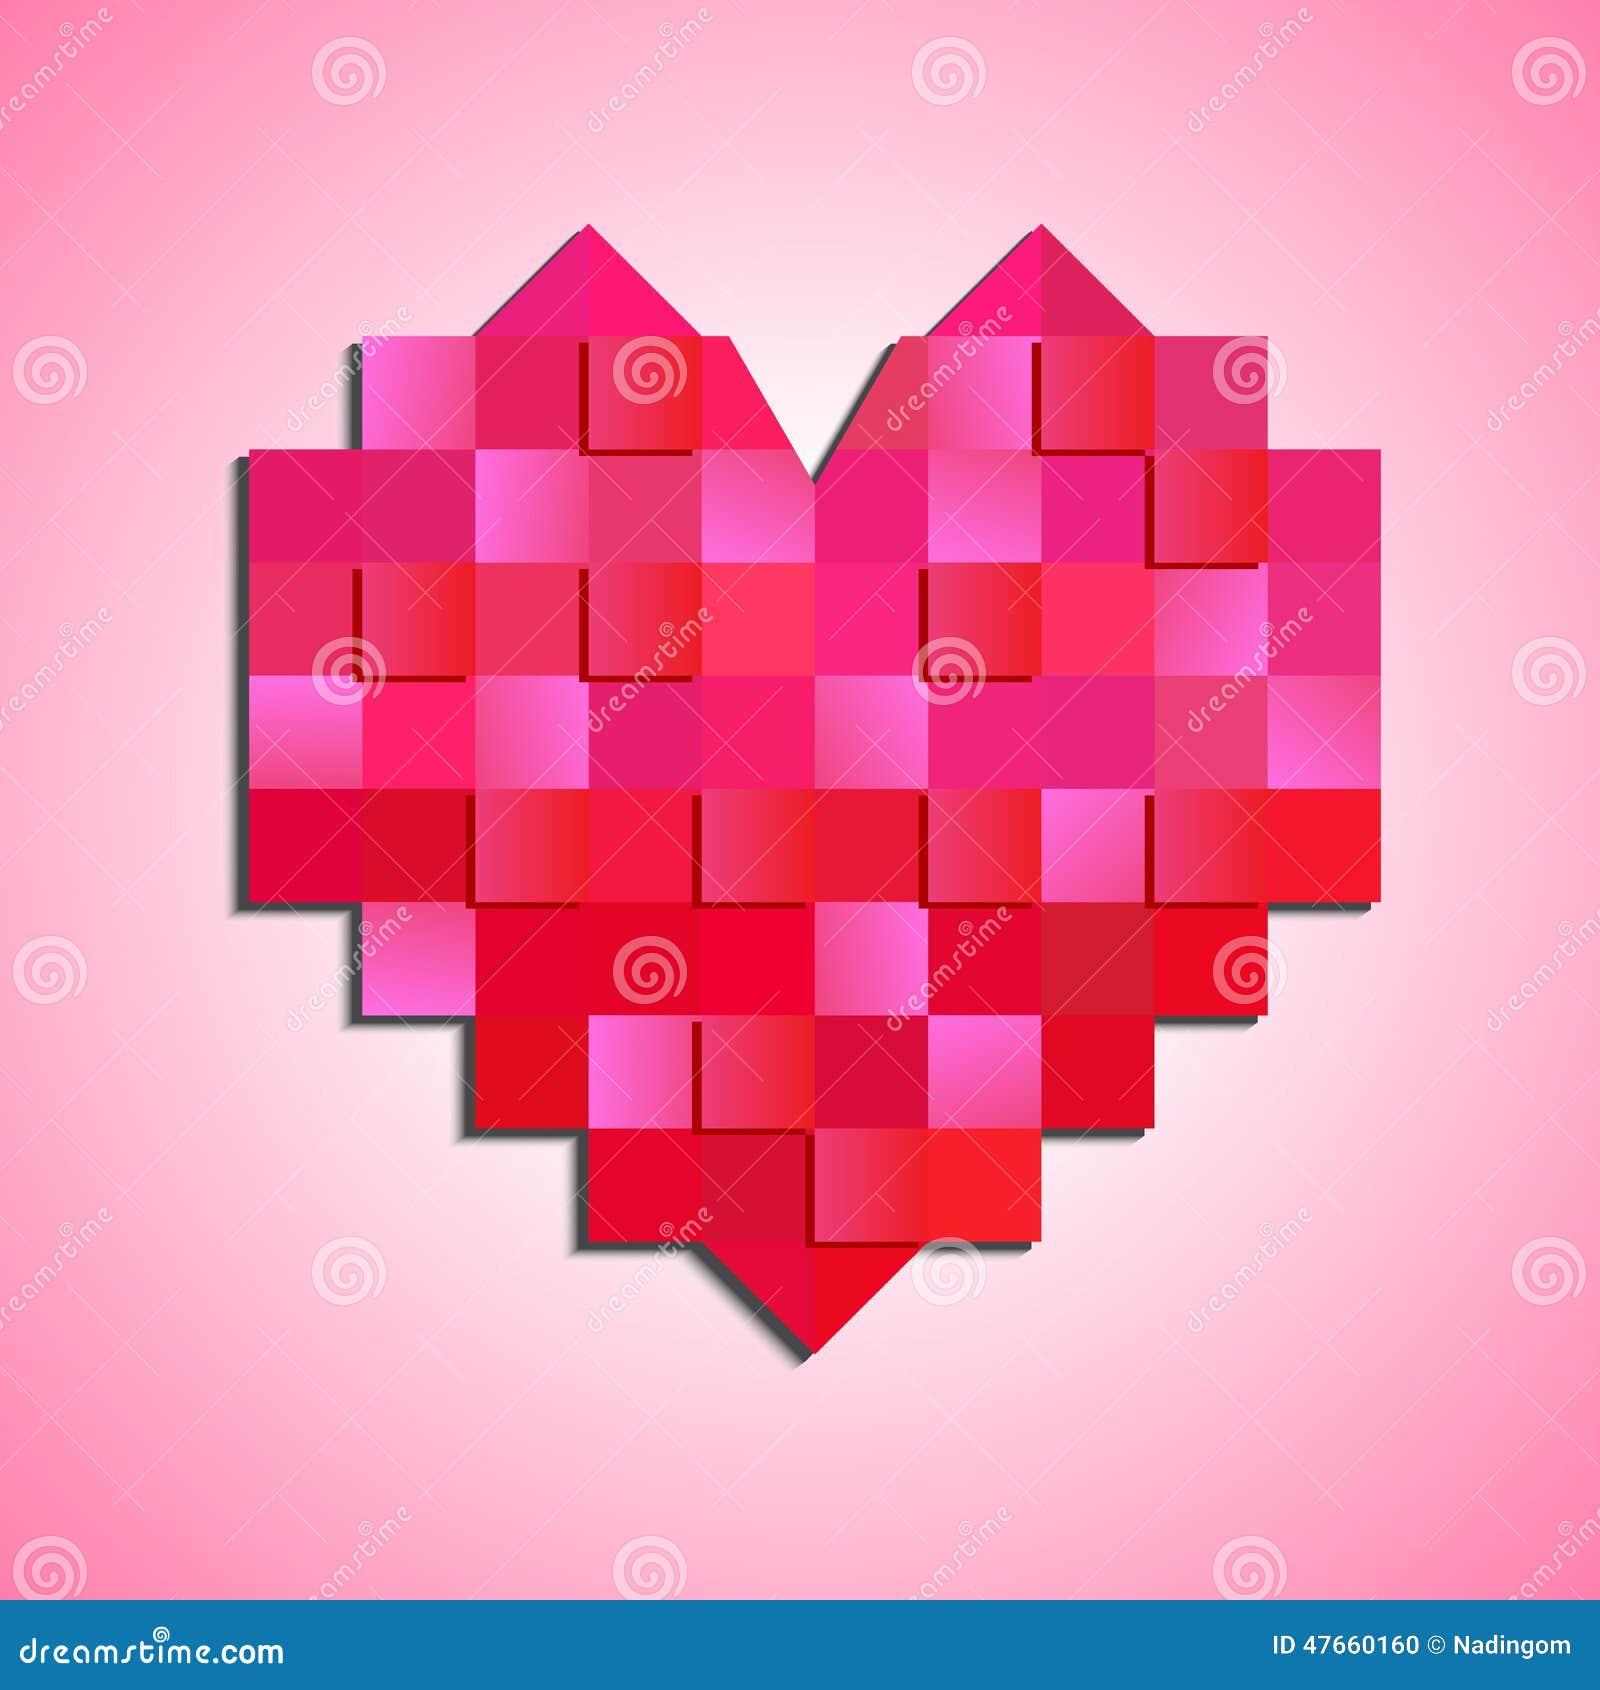 системой картинки сердце в квадрат аспект творчества, несомненно